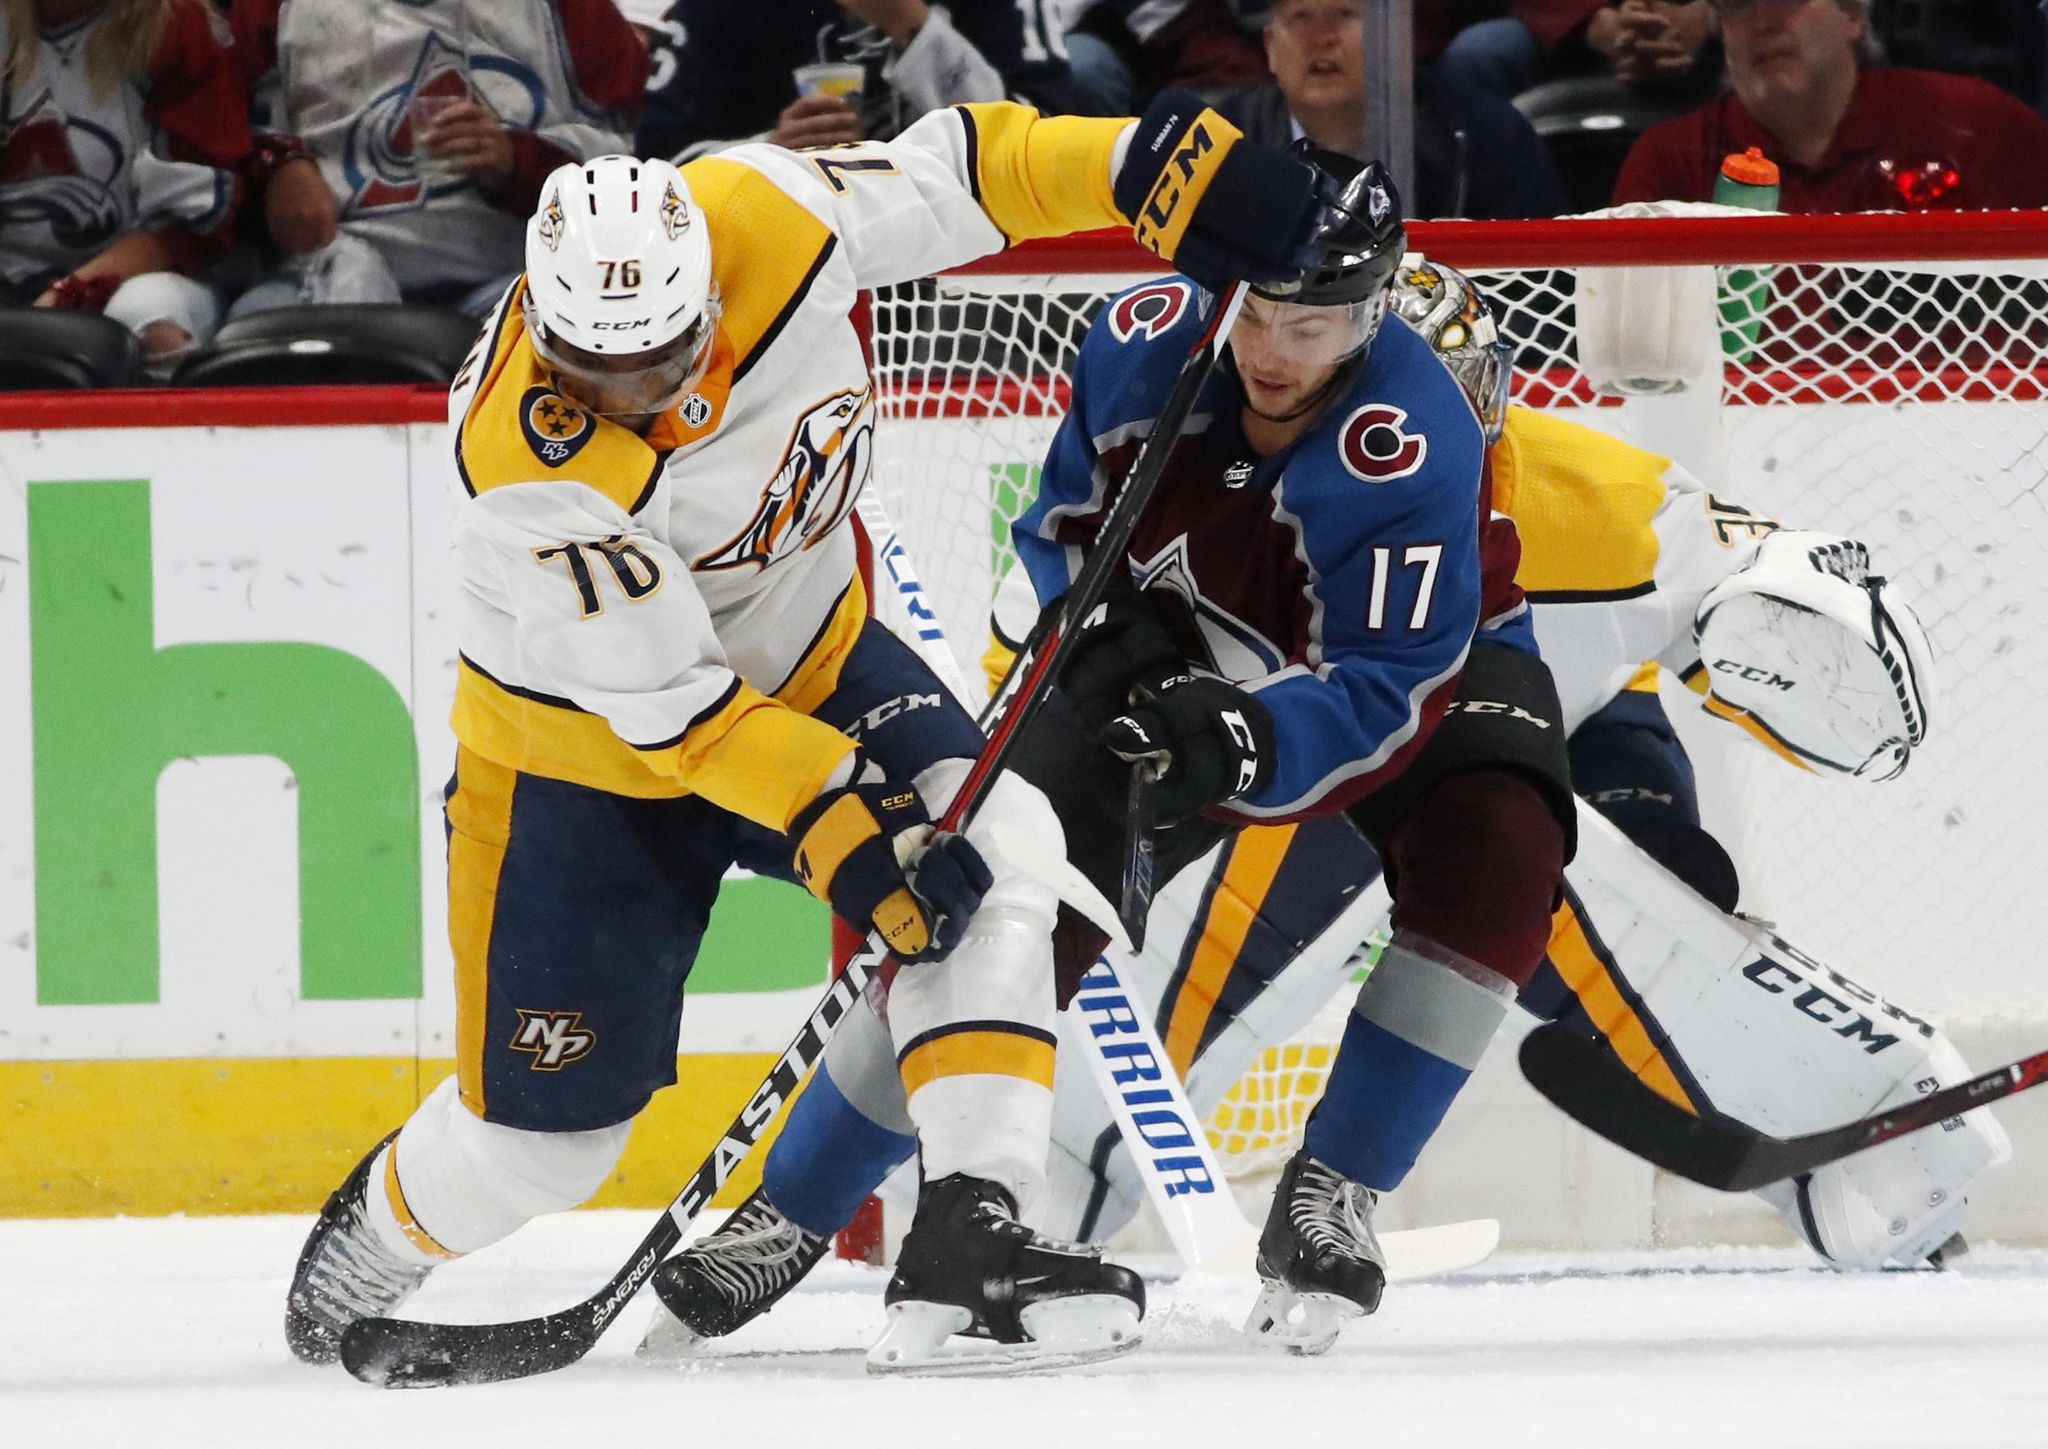 Predators_avalanche_hockey_88948_s2048x1449